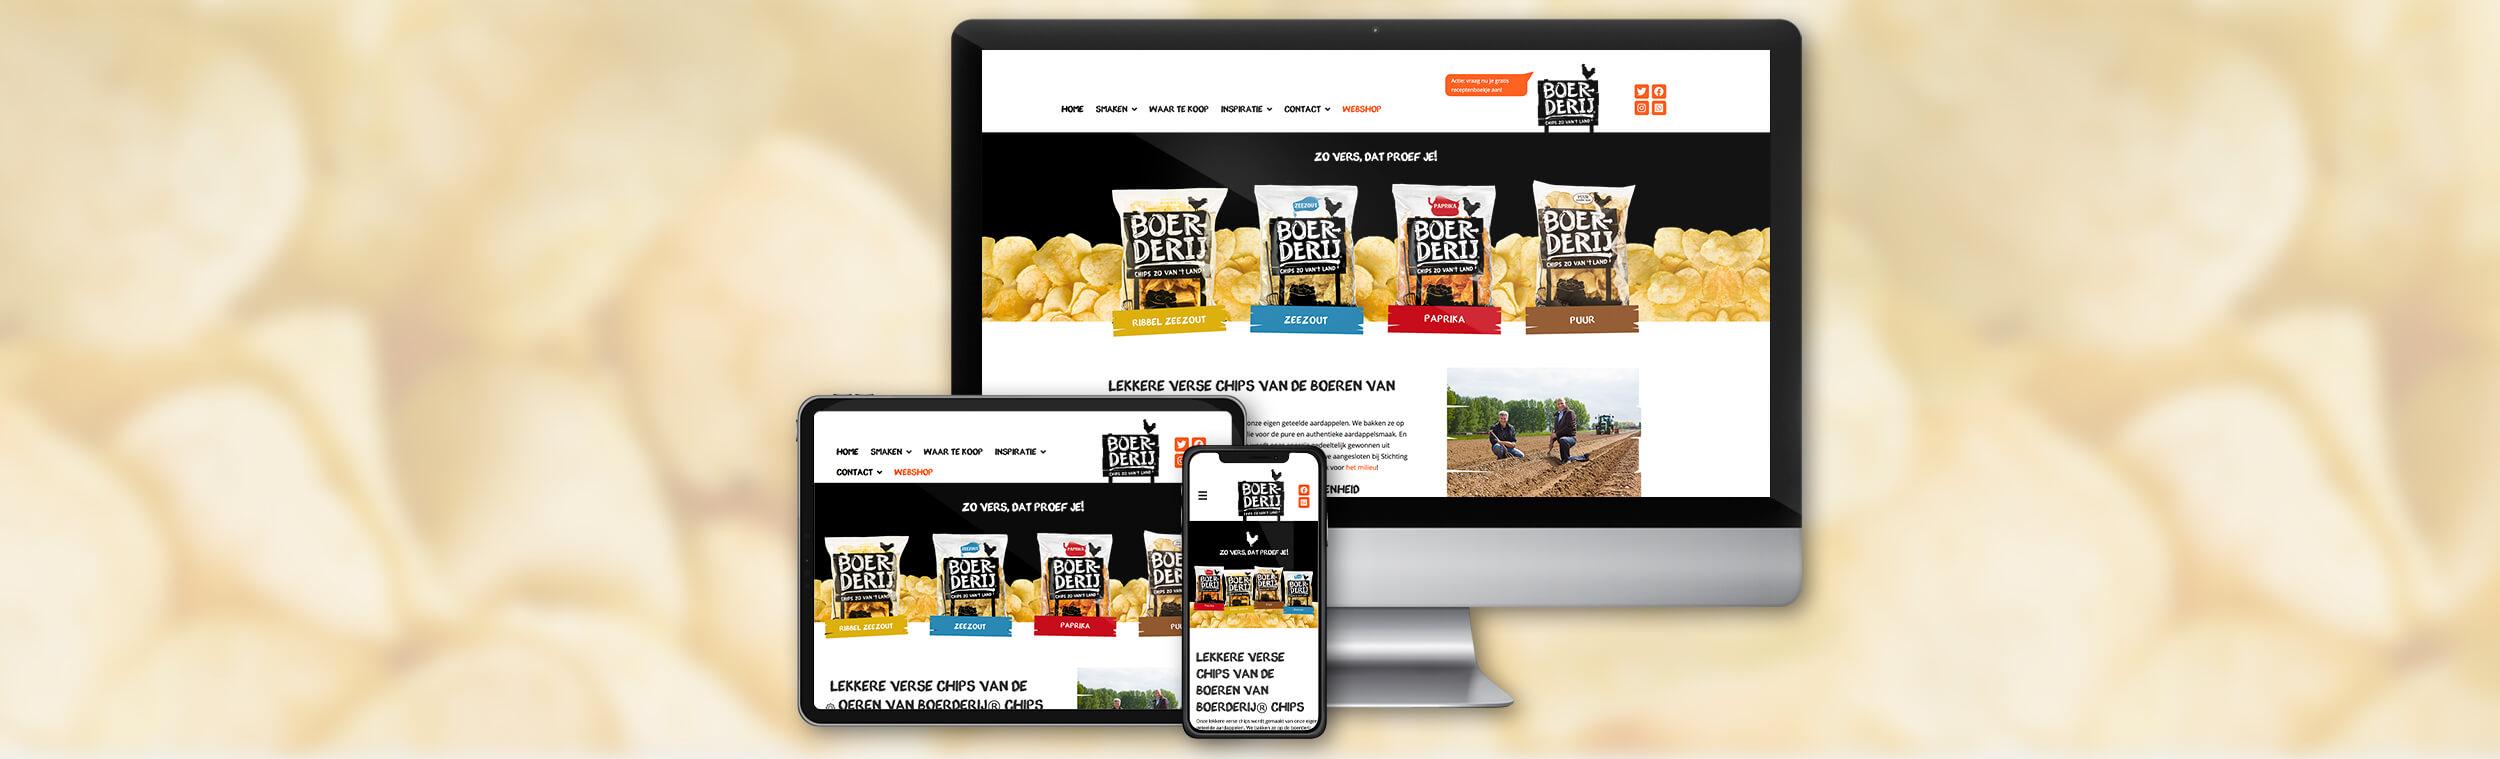 Boerderij Chips - Website